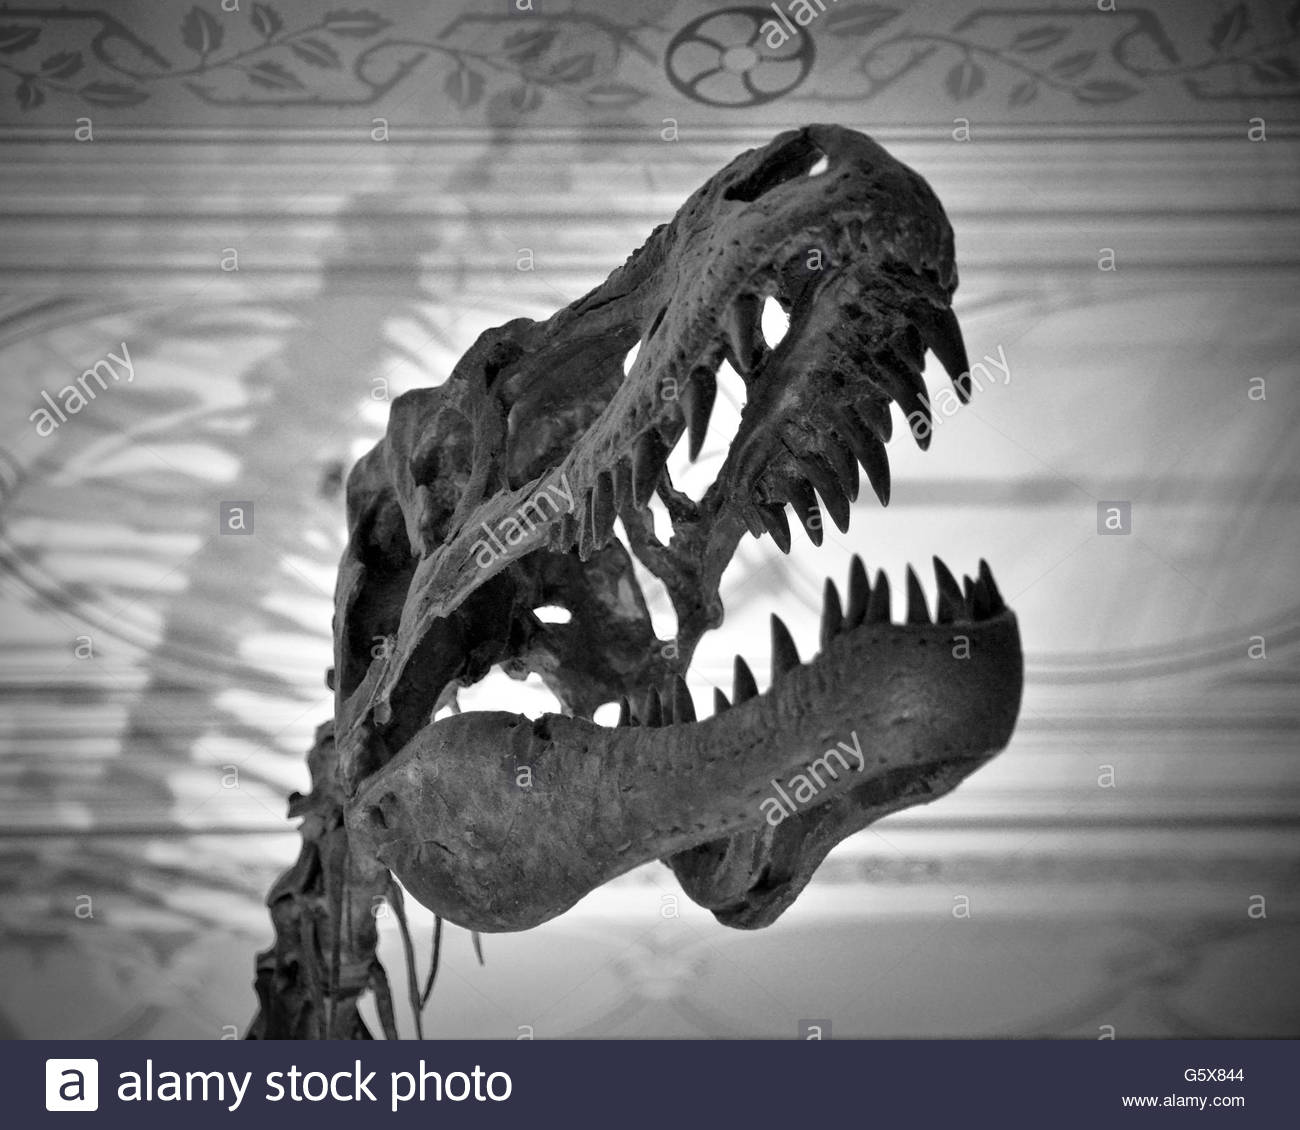 Albertosaurus Dinosaur Skull - Stock Image